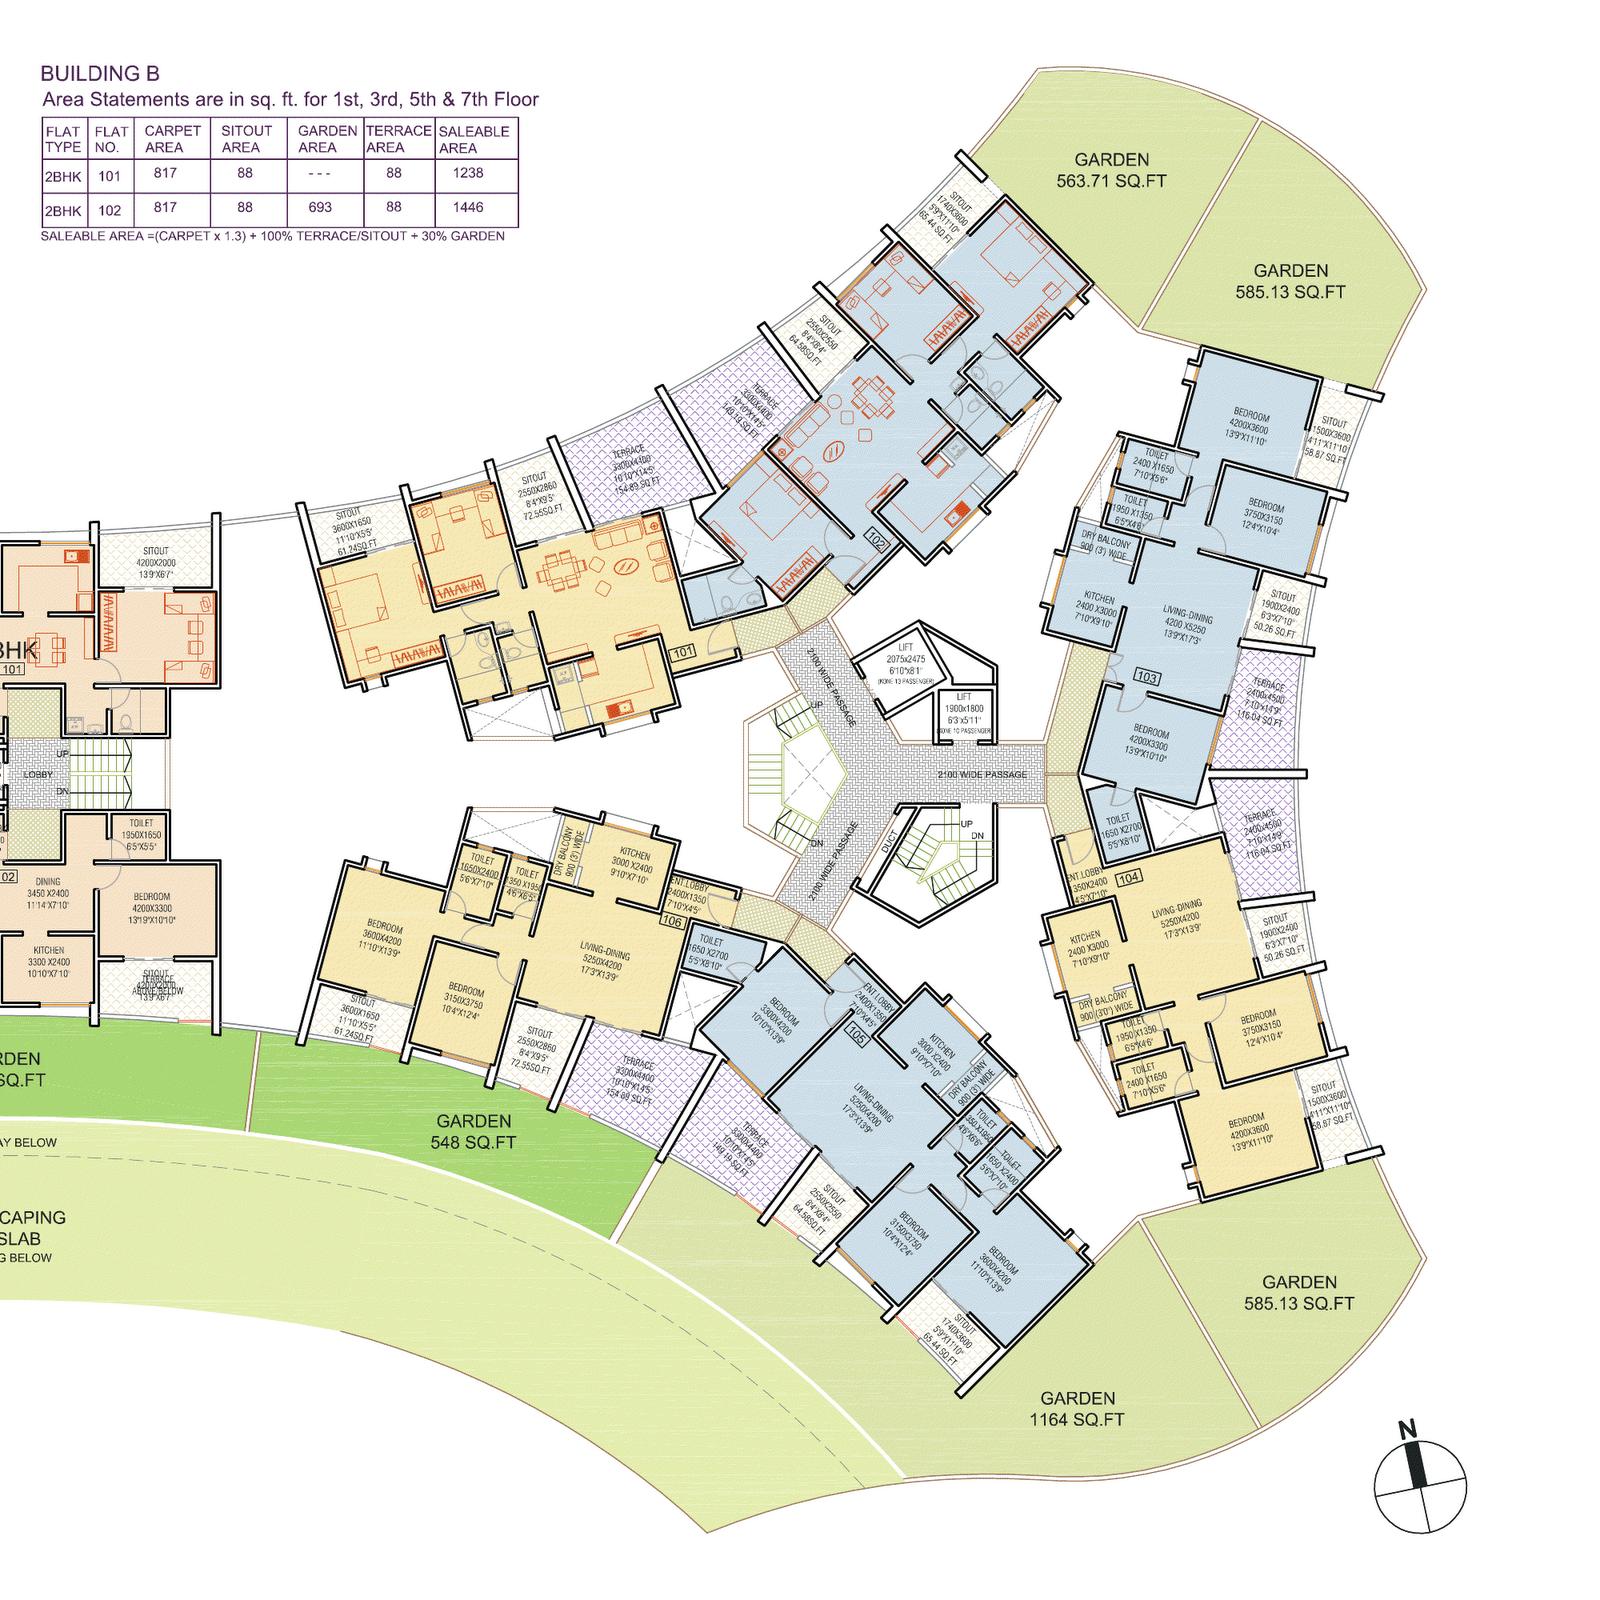 ravi karandeekar s pune real estate market news blog